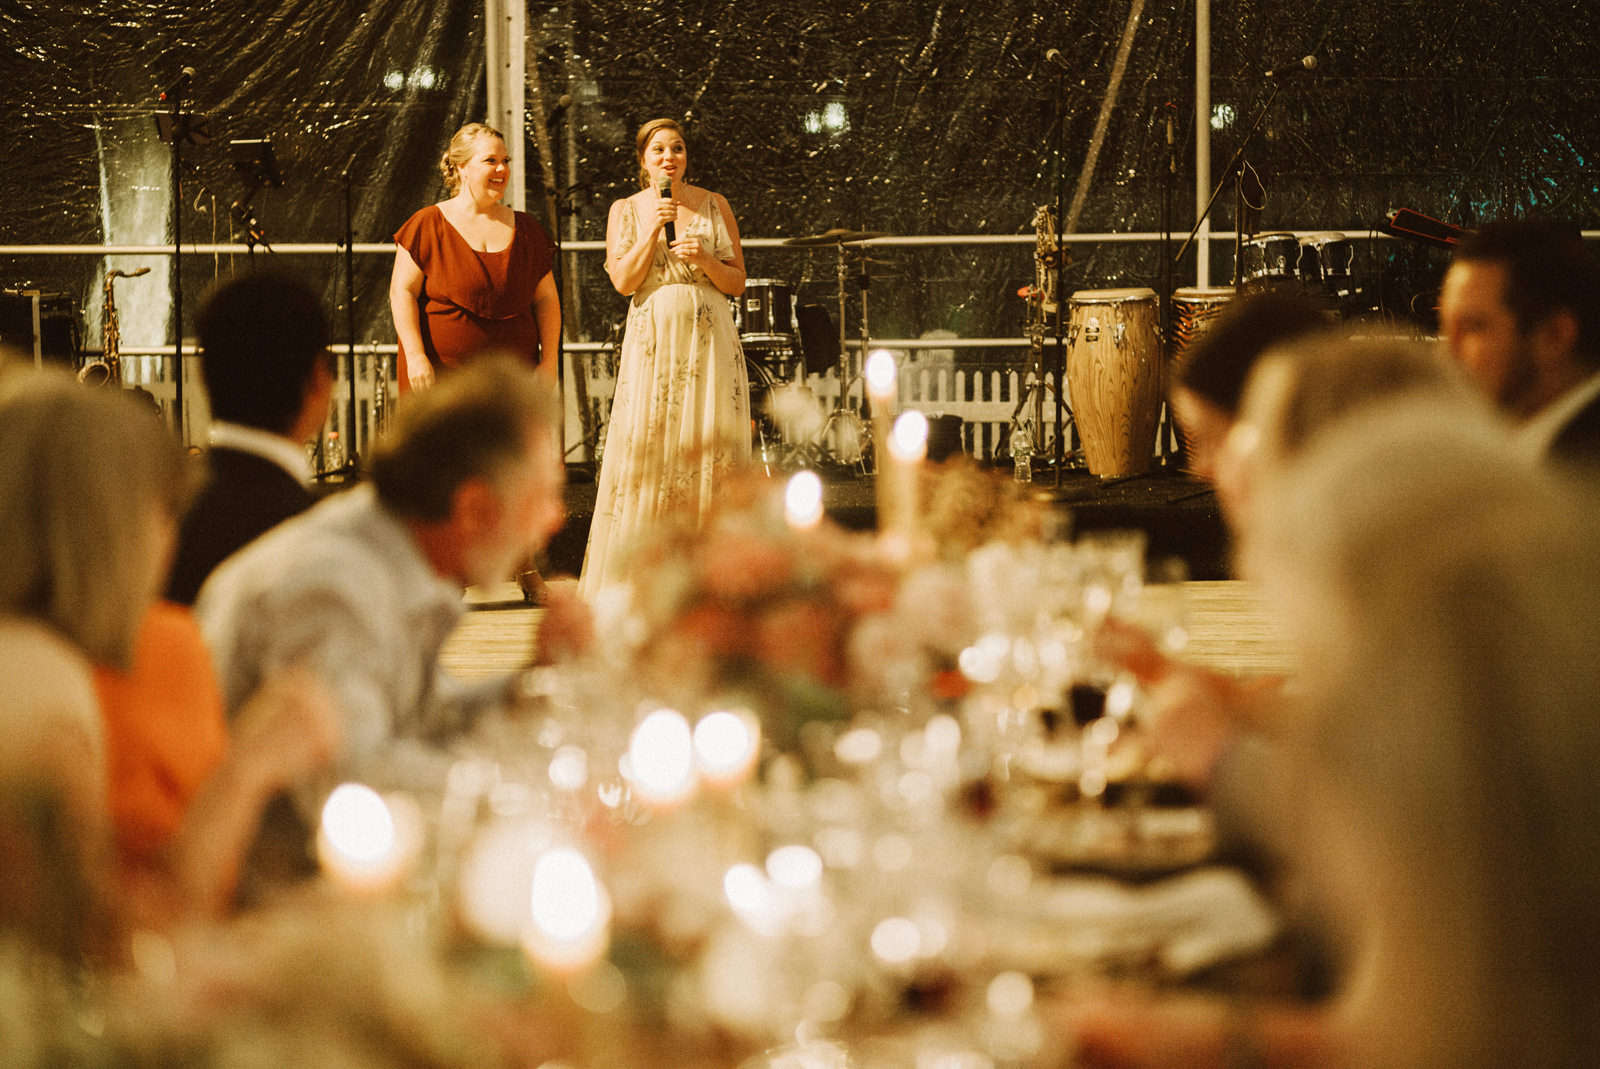 bridgeport-wedding-158 BRIDGEPORT, CONNECTICUT BACKYARD WEDDING